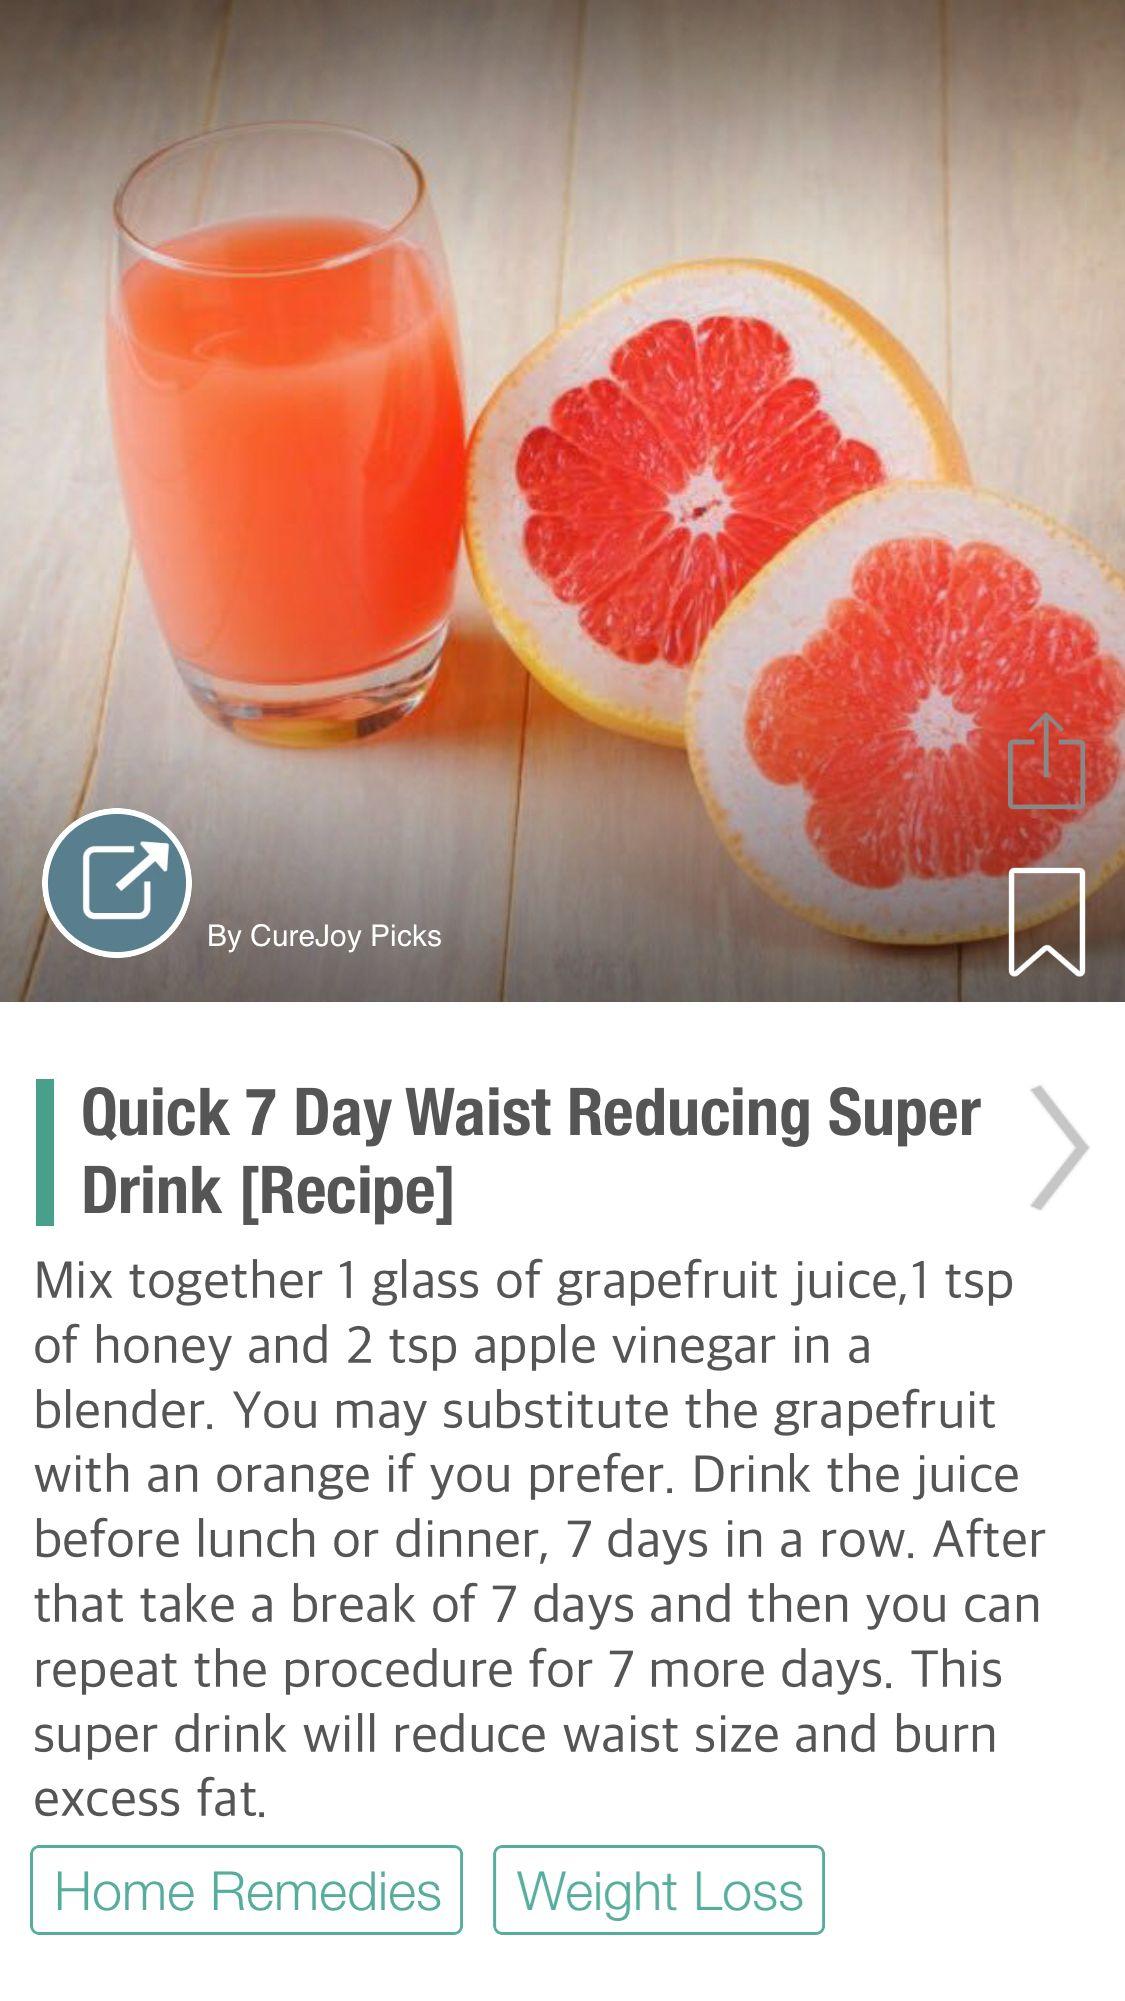 Quick 7 Day Waist Reducing Super Drink [Recipe] Drinks